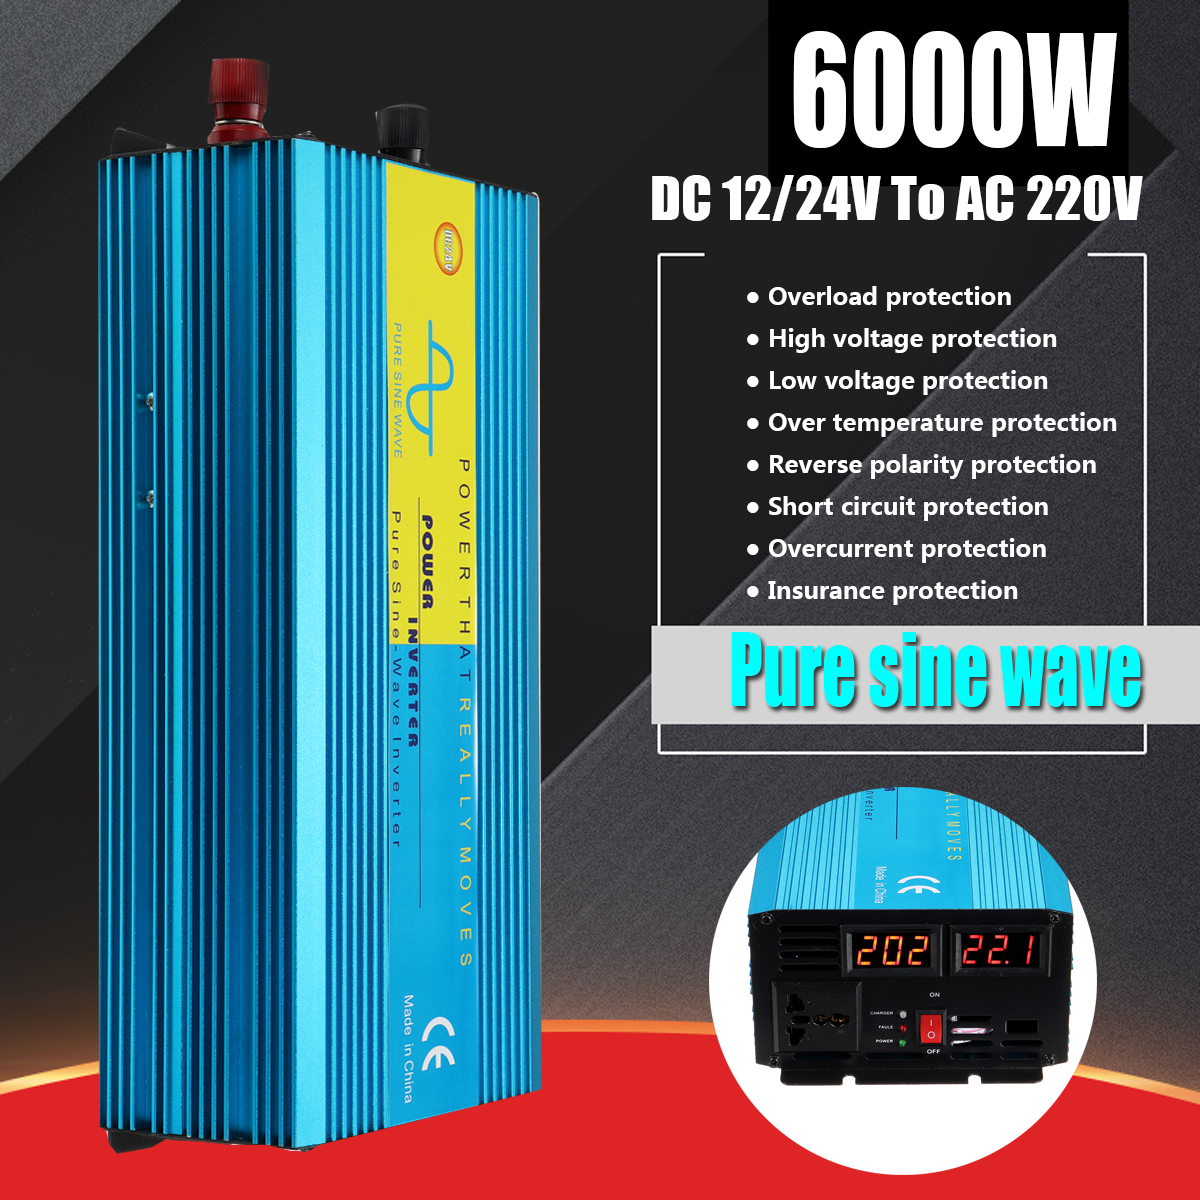 Pure Sine Wave Watt Power Inverter PEAK 4000W DC12/24V To 220V Car Caravan Camping 8 Intelligent Protect Voltage Transformer